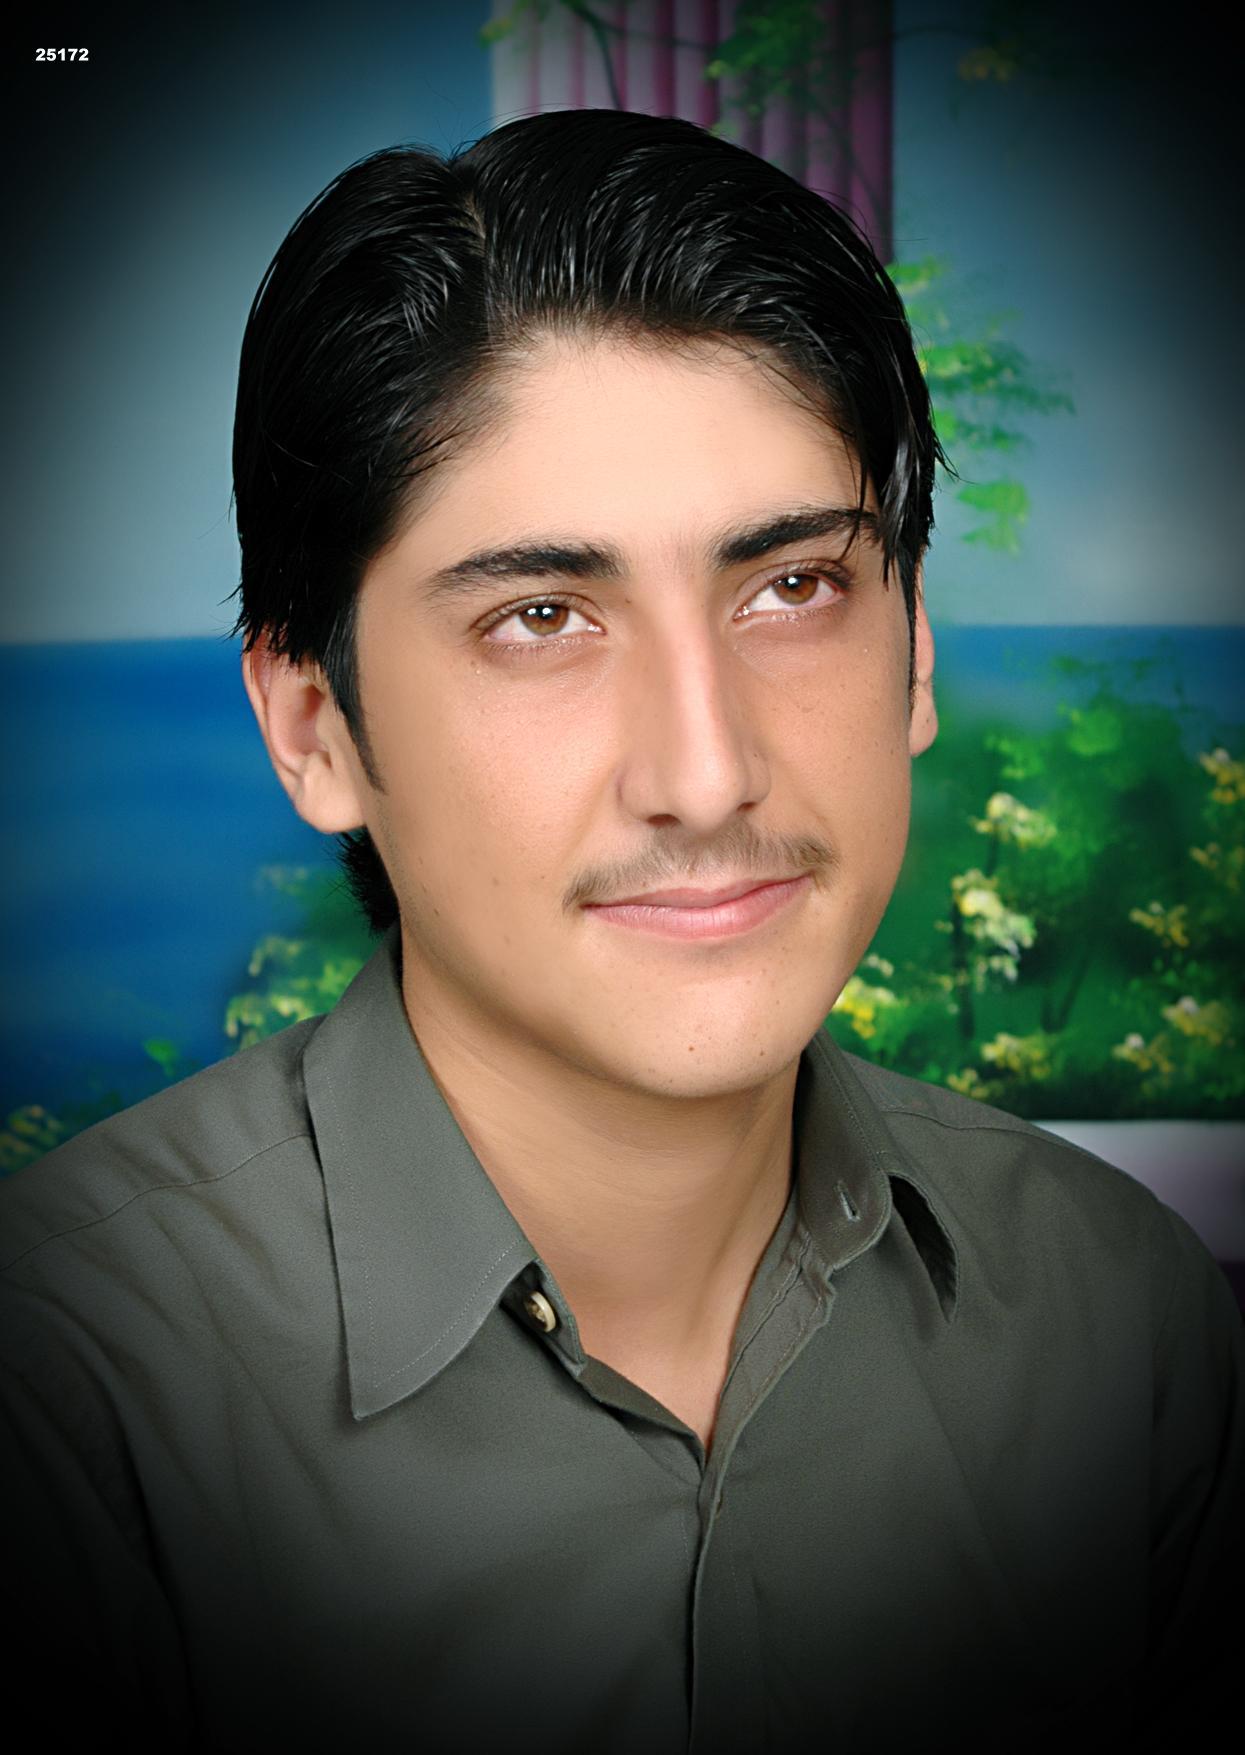 Kostenlose online dating sites pakistan